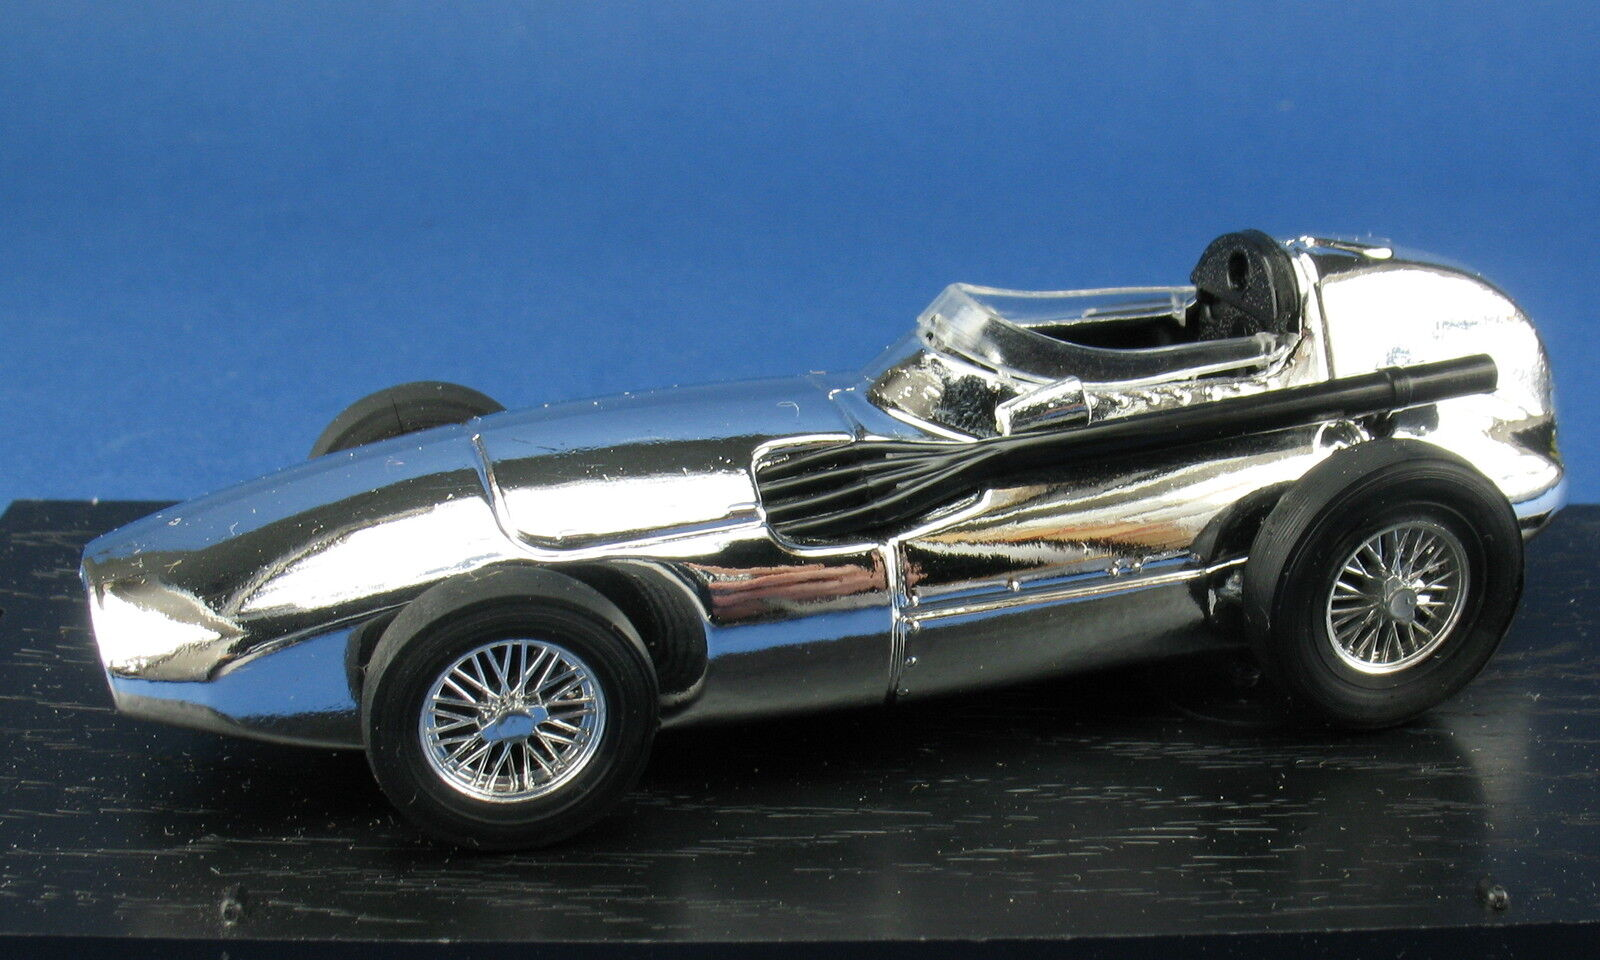 Pfuit-Vanwall 1957-Limitée Nº Nº Nº 2050 - 100 ans automobile - 1 43 - en boîte c8c313